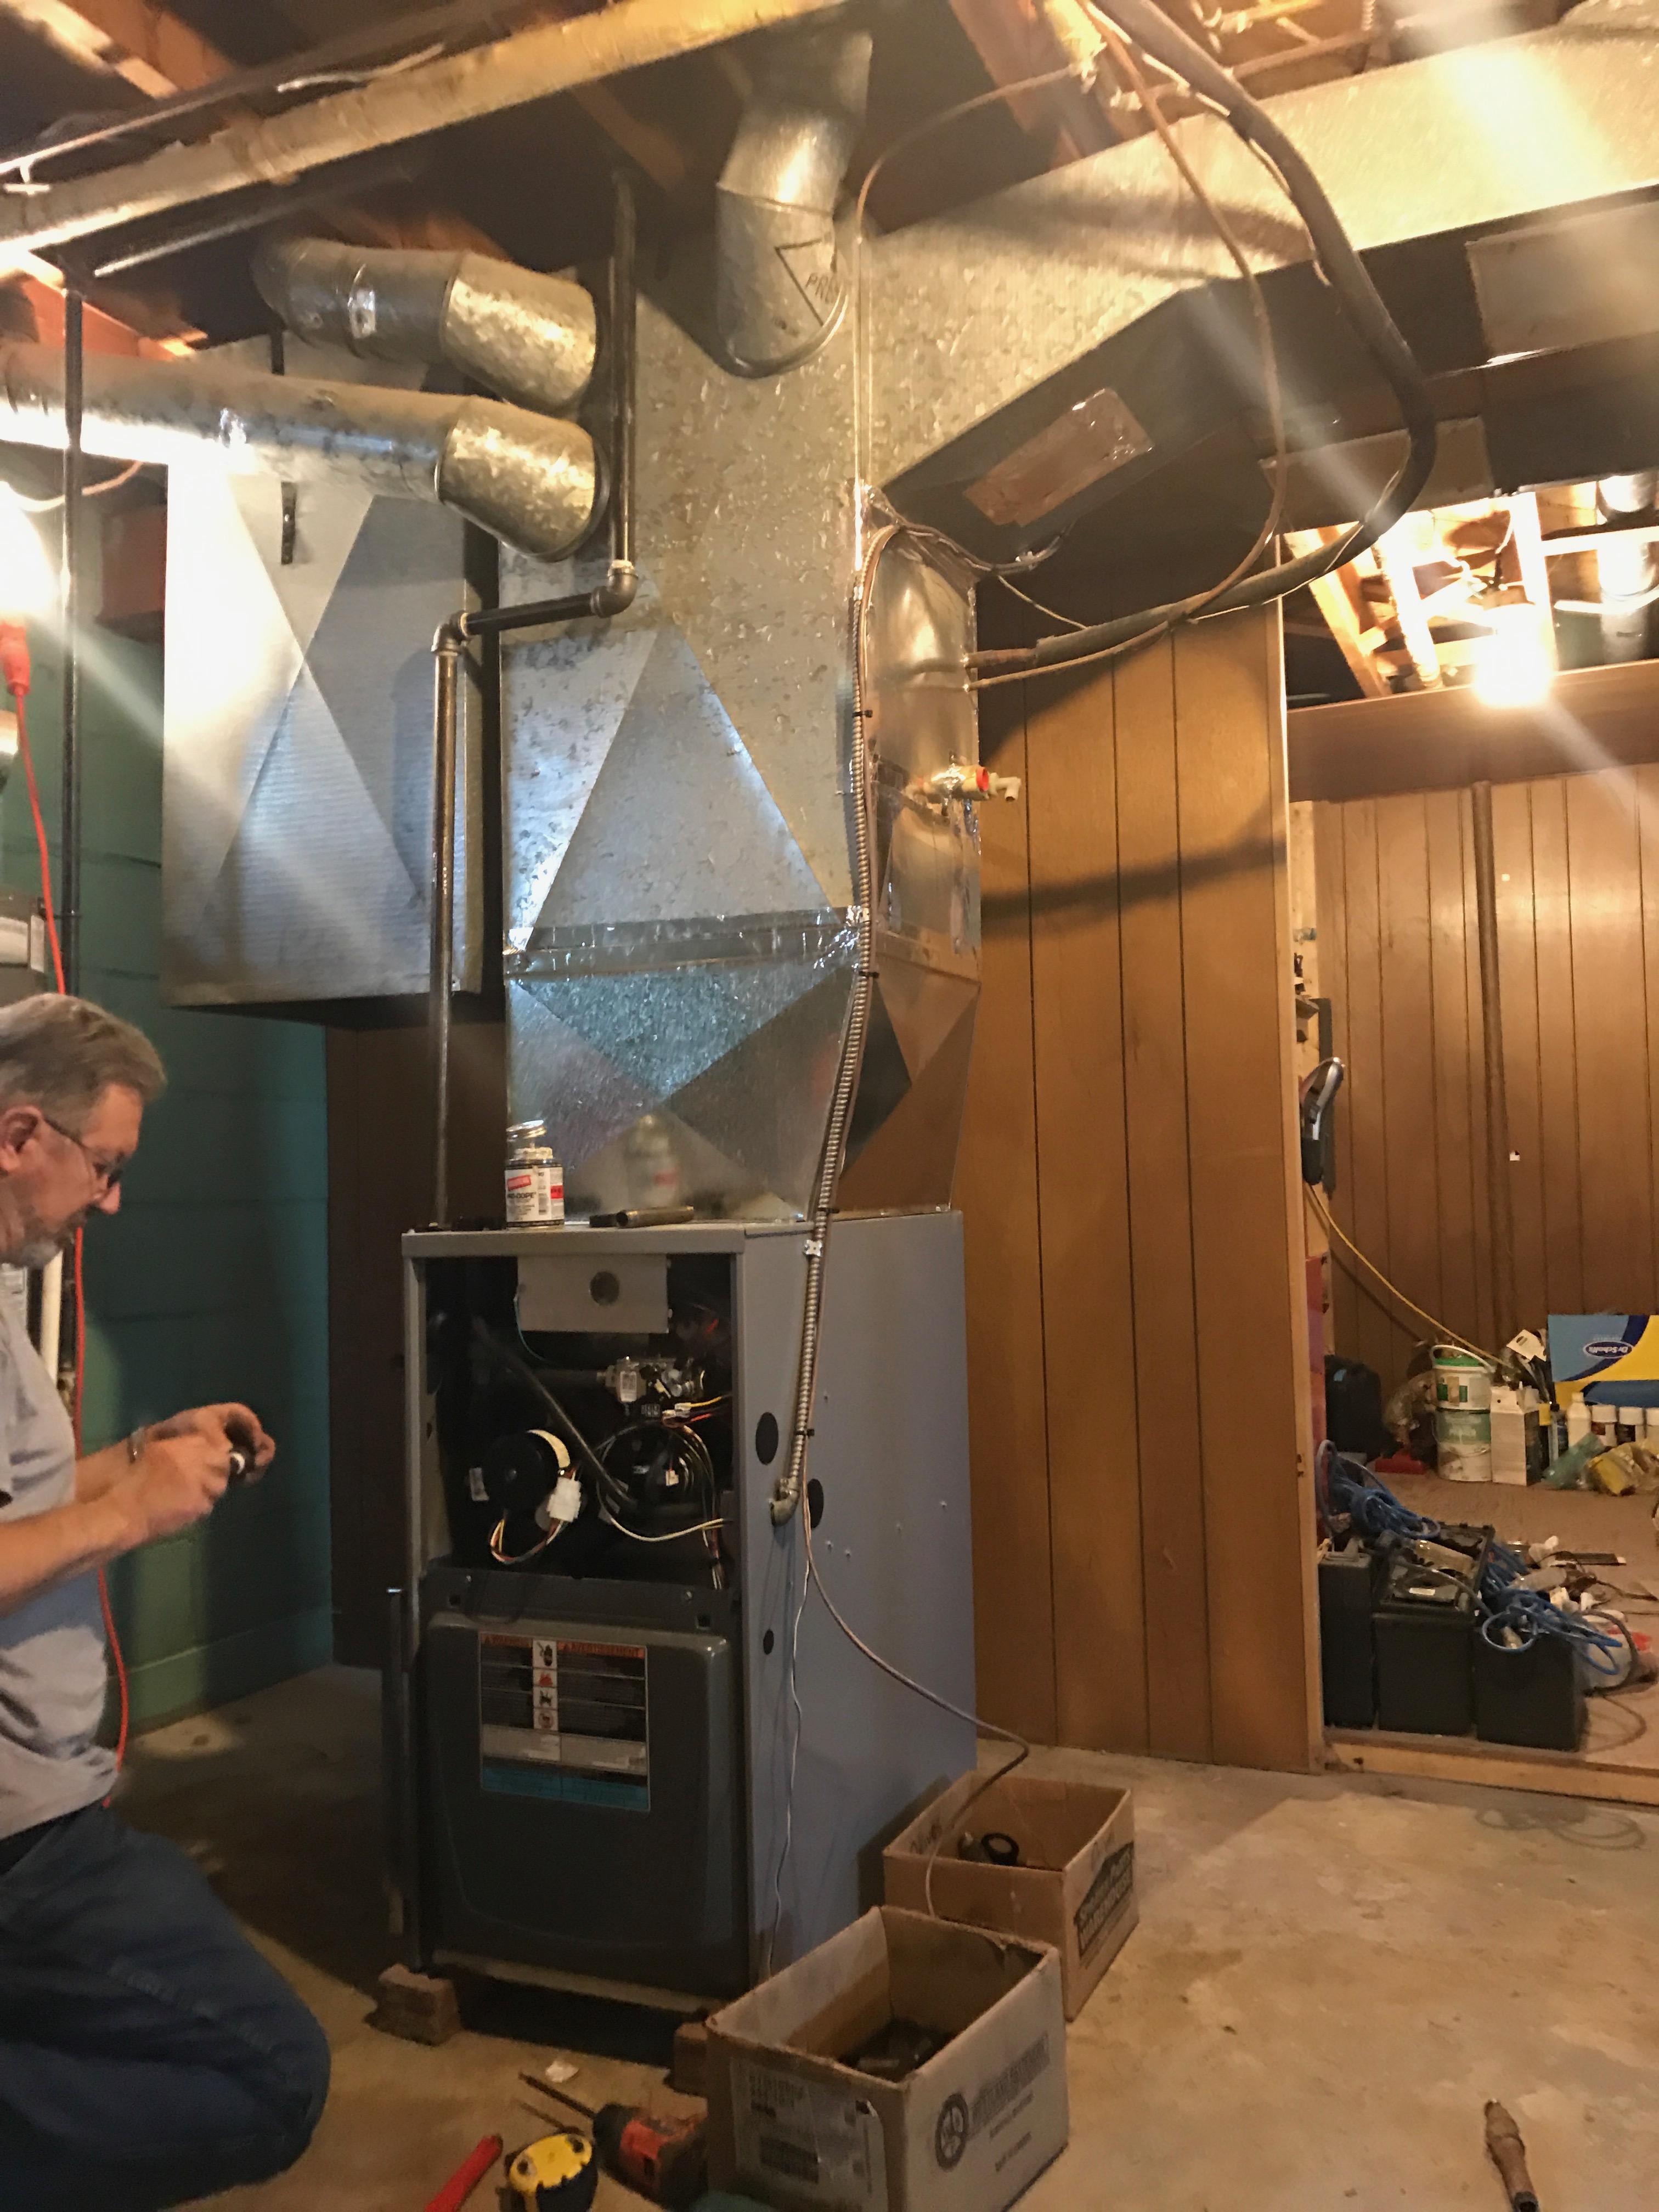 Gas Furnace 3 - Dugard Plumbing, Heating & Cooling